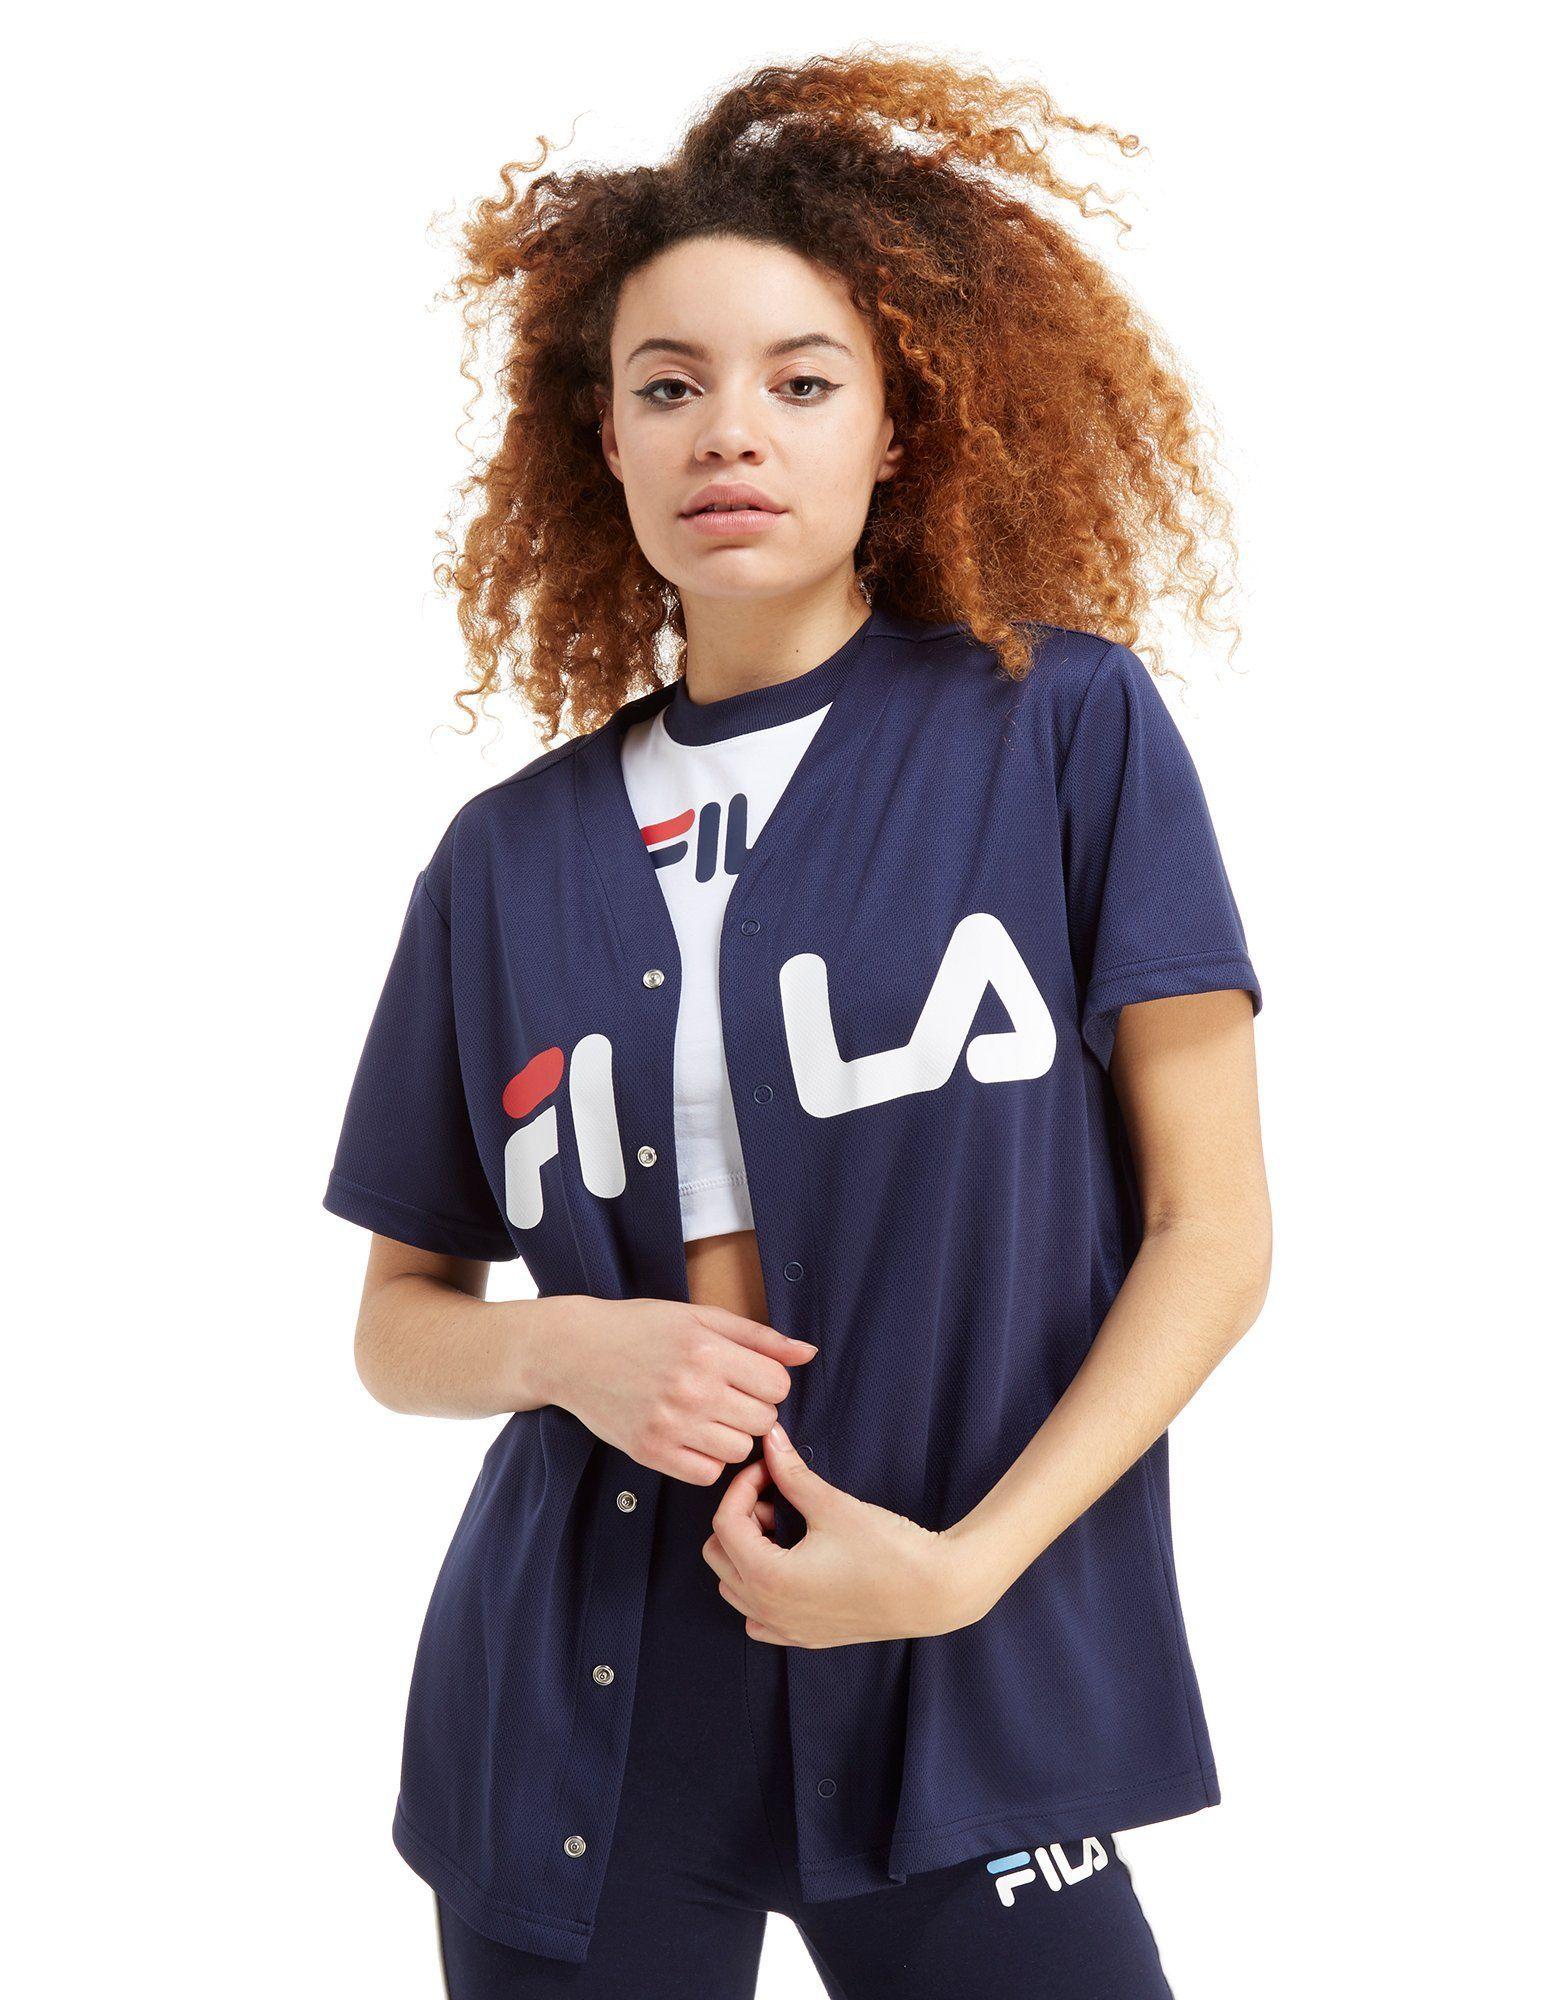 18dedc4fe9b Fila Mesh Baseball T-Shirt Femme – Achète en ligne Fila Mesh Baseball T- Shirt Femme avec JD Sports, le leader du Sport Fashion et Streetwear en  Angleterre.